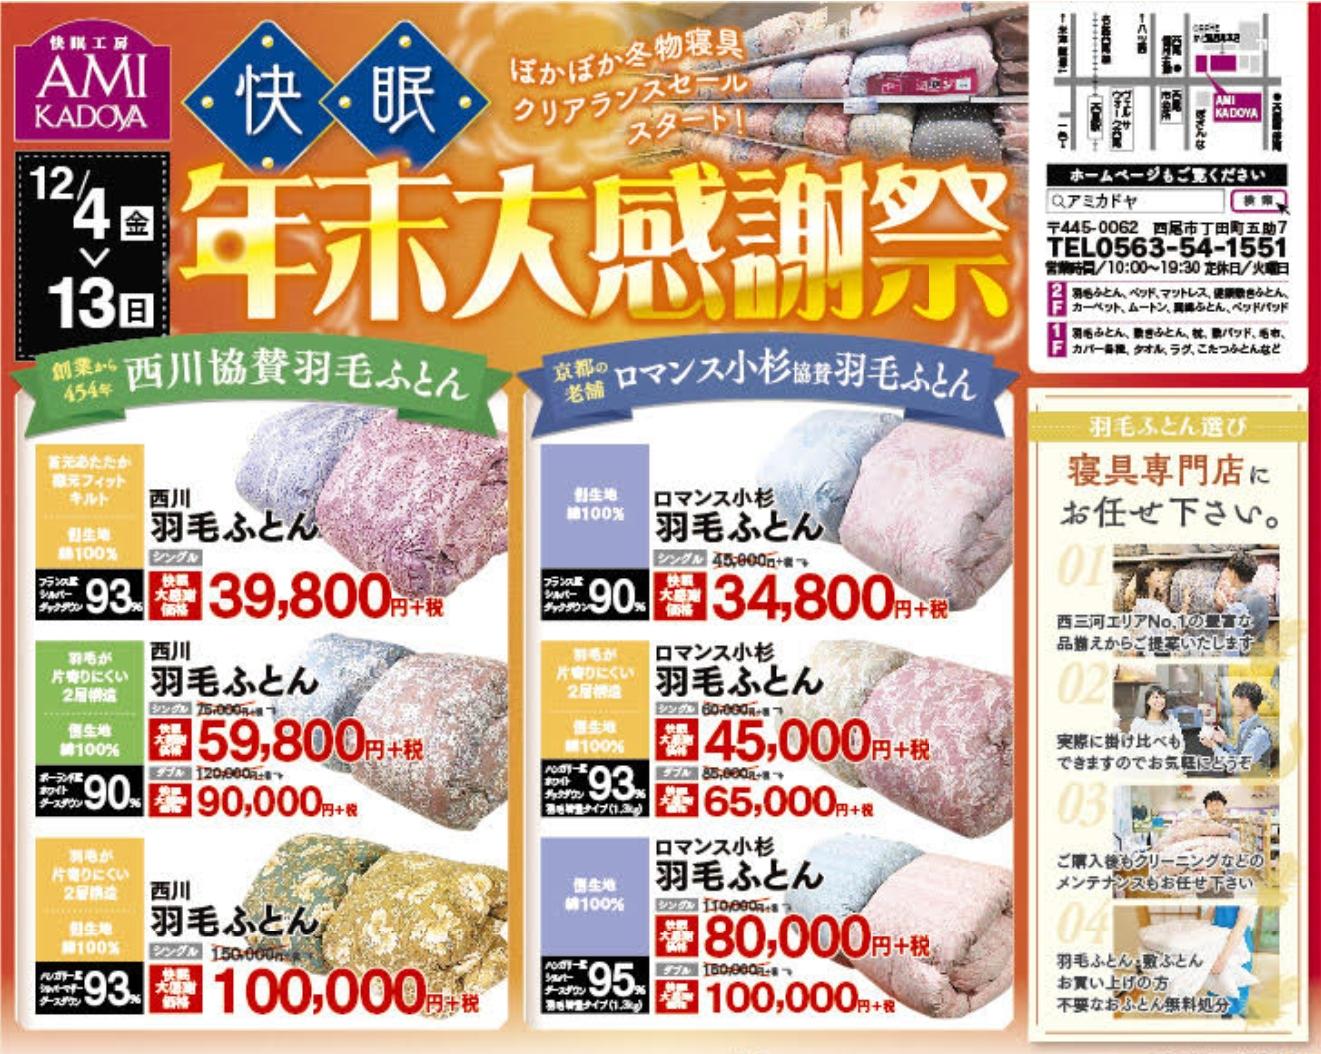 amikadoya20201201